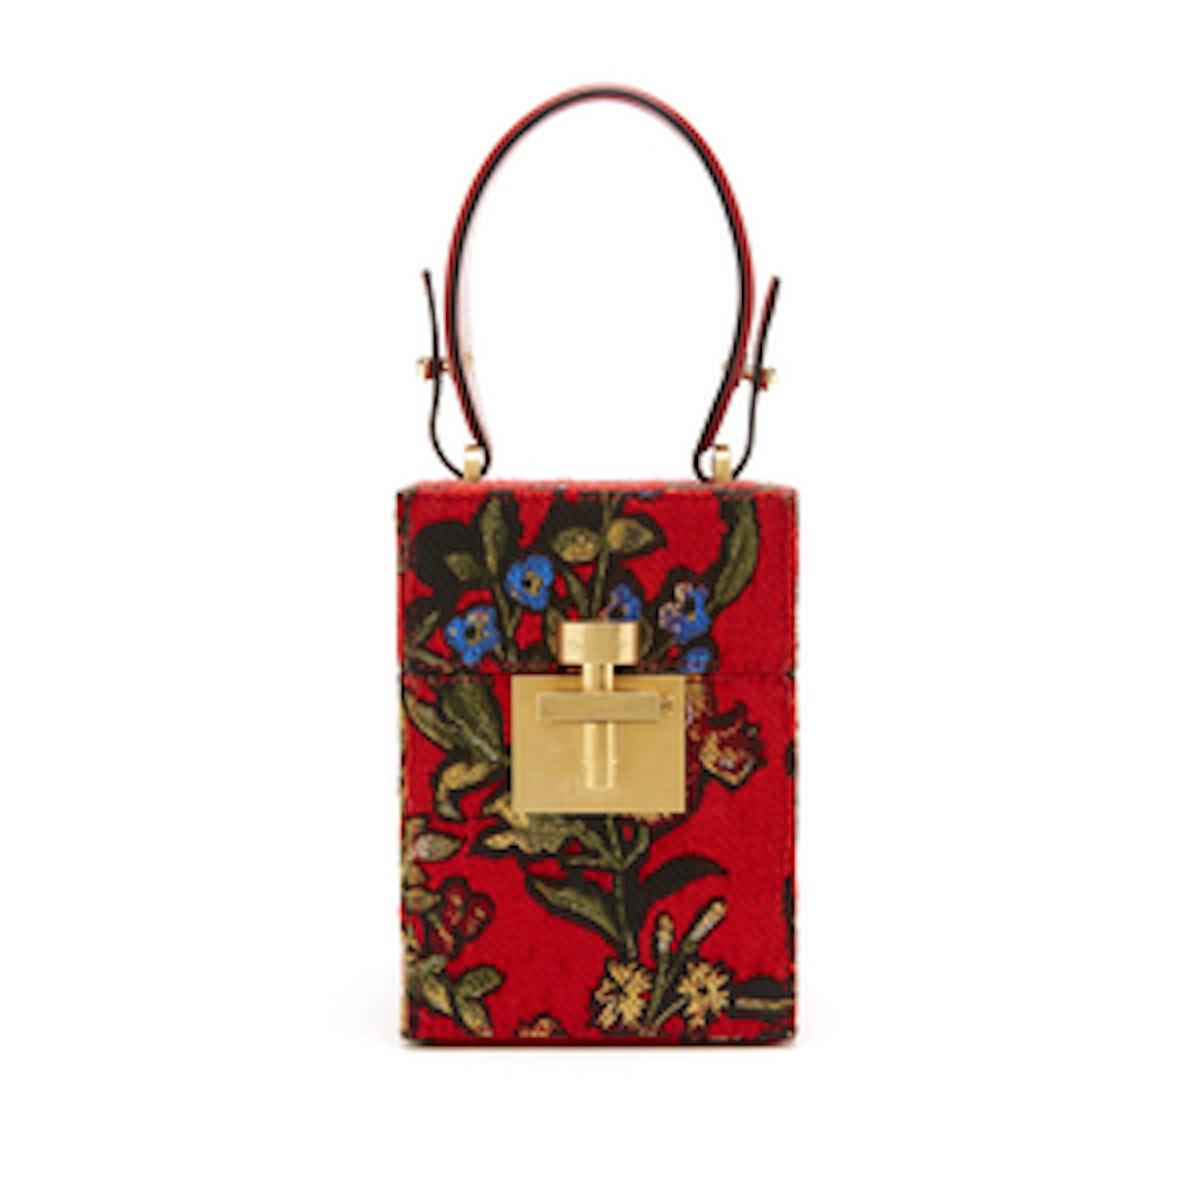 Jaquard Mini Alibi Bag